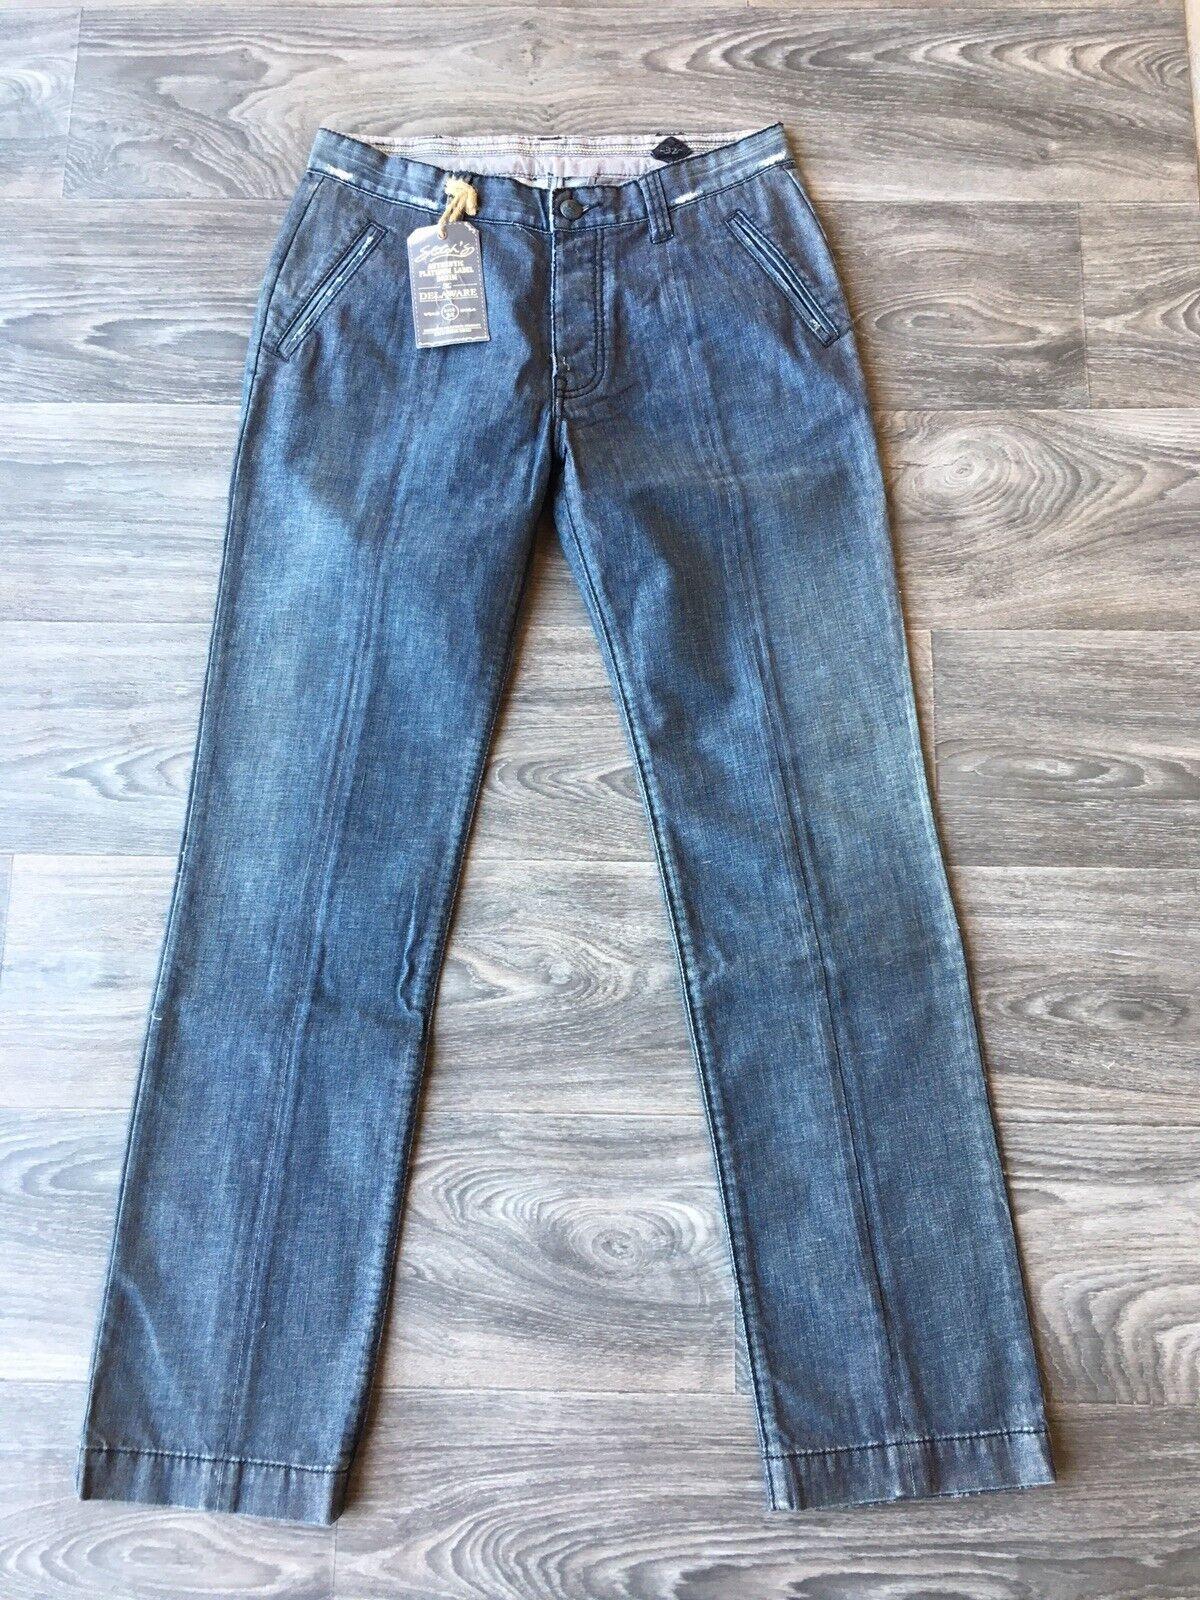 NWT Stitch's Men's The Delaware Boot Cut Leg Jeans Phoenix Wash Size 32